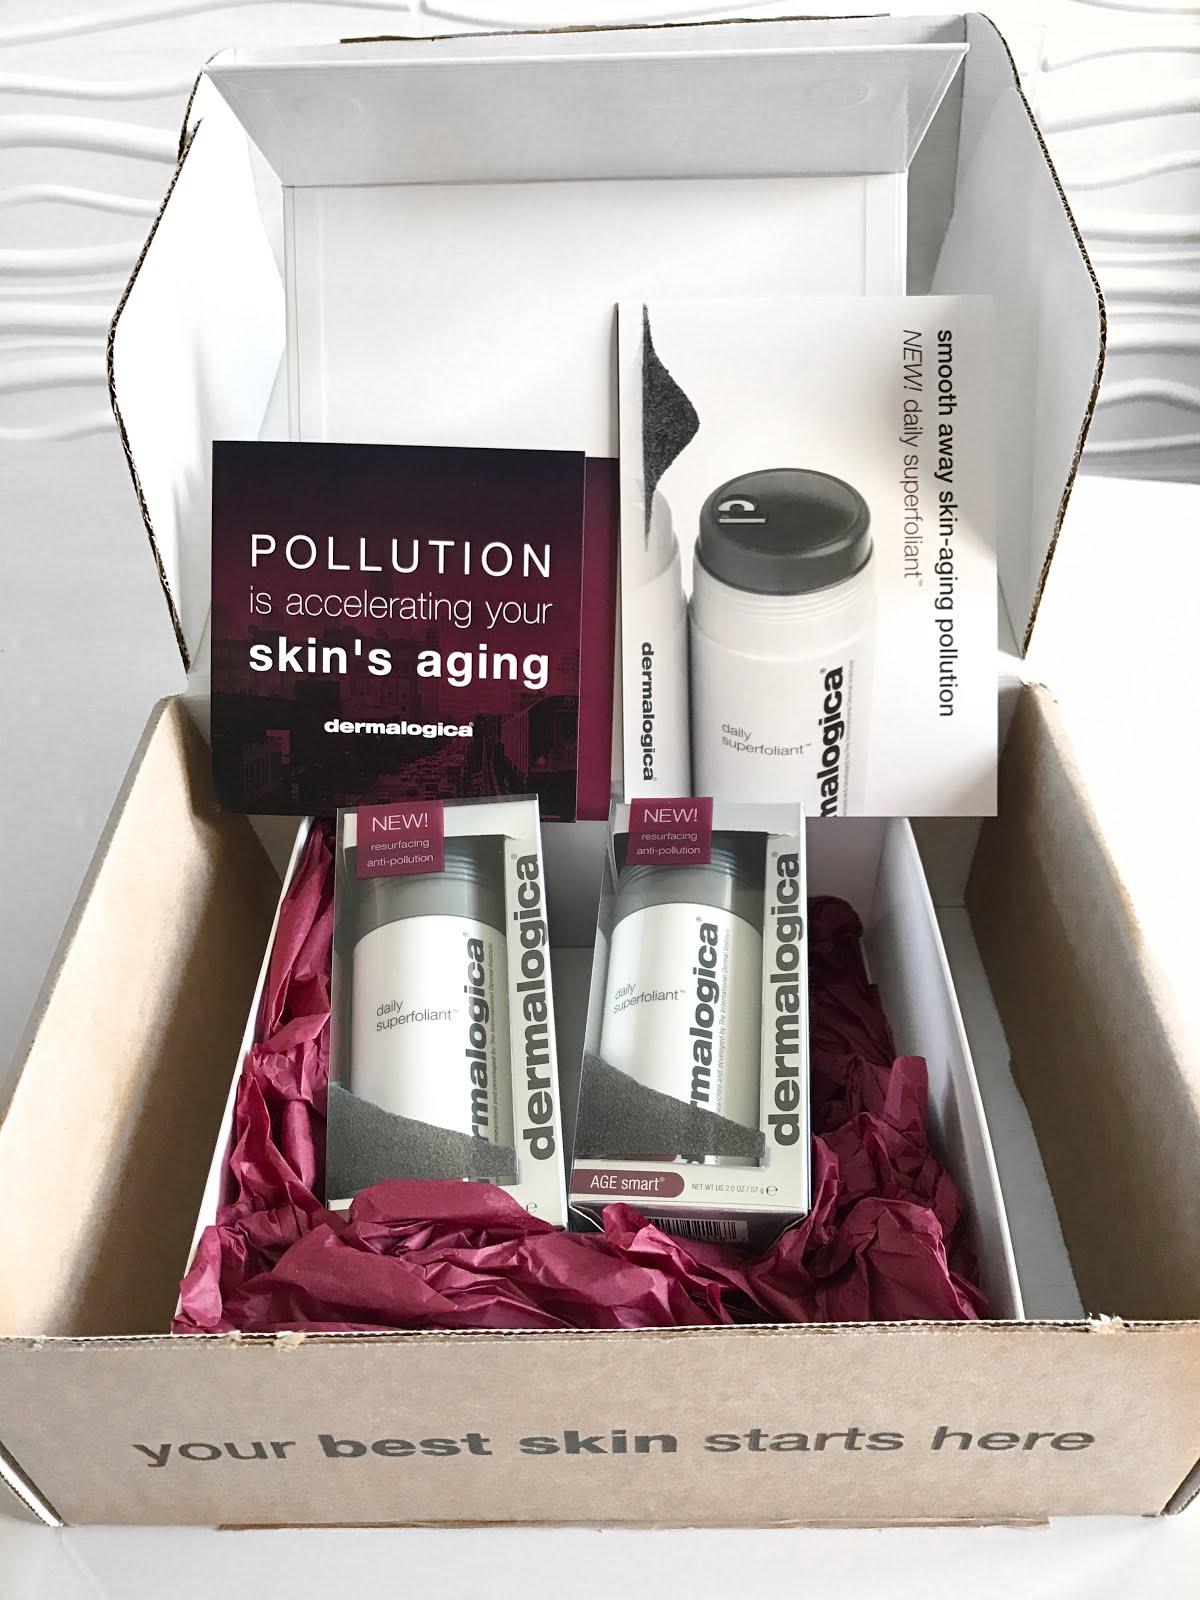 POM-Mail-It-Cosmetics-Dermalogica-Pur-Cosmetics-Hask-Elizabeth-Arden-Vivi-Brizuela-PinkOrchidMakeup